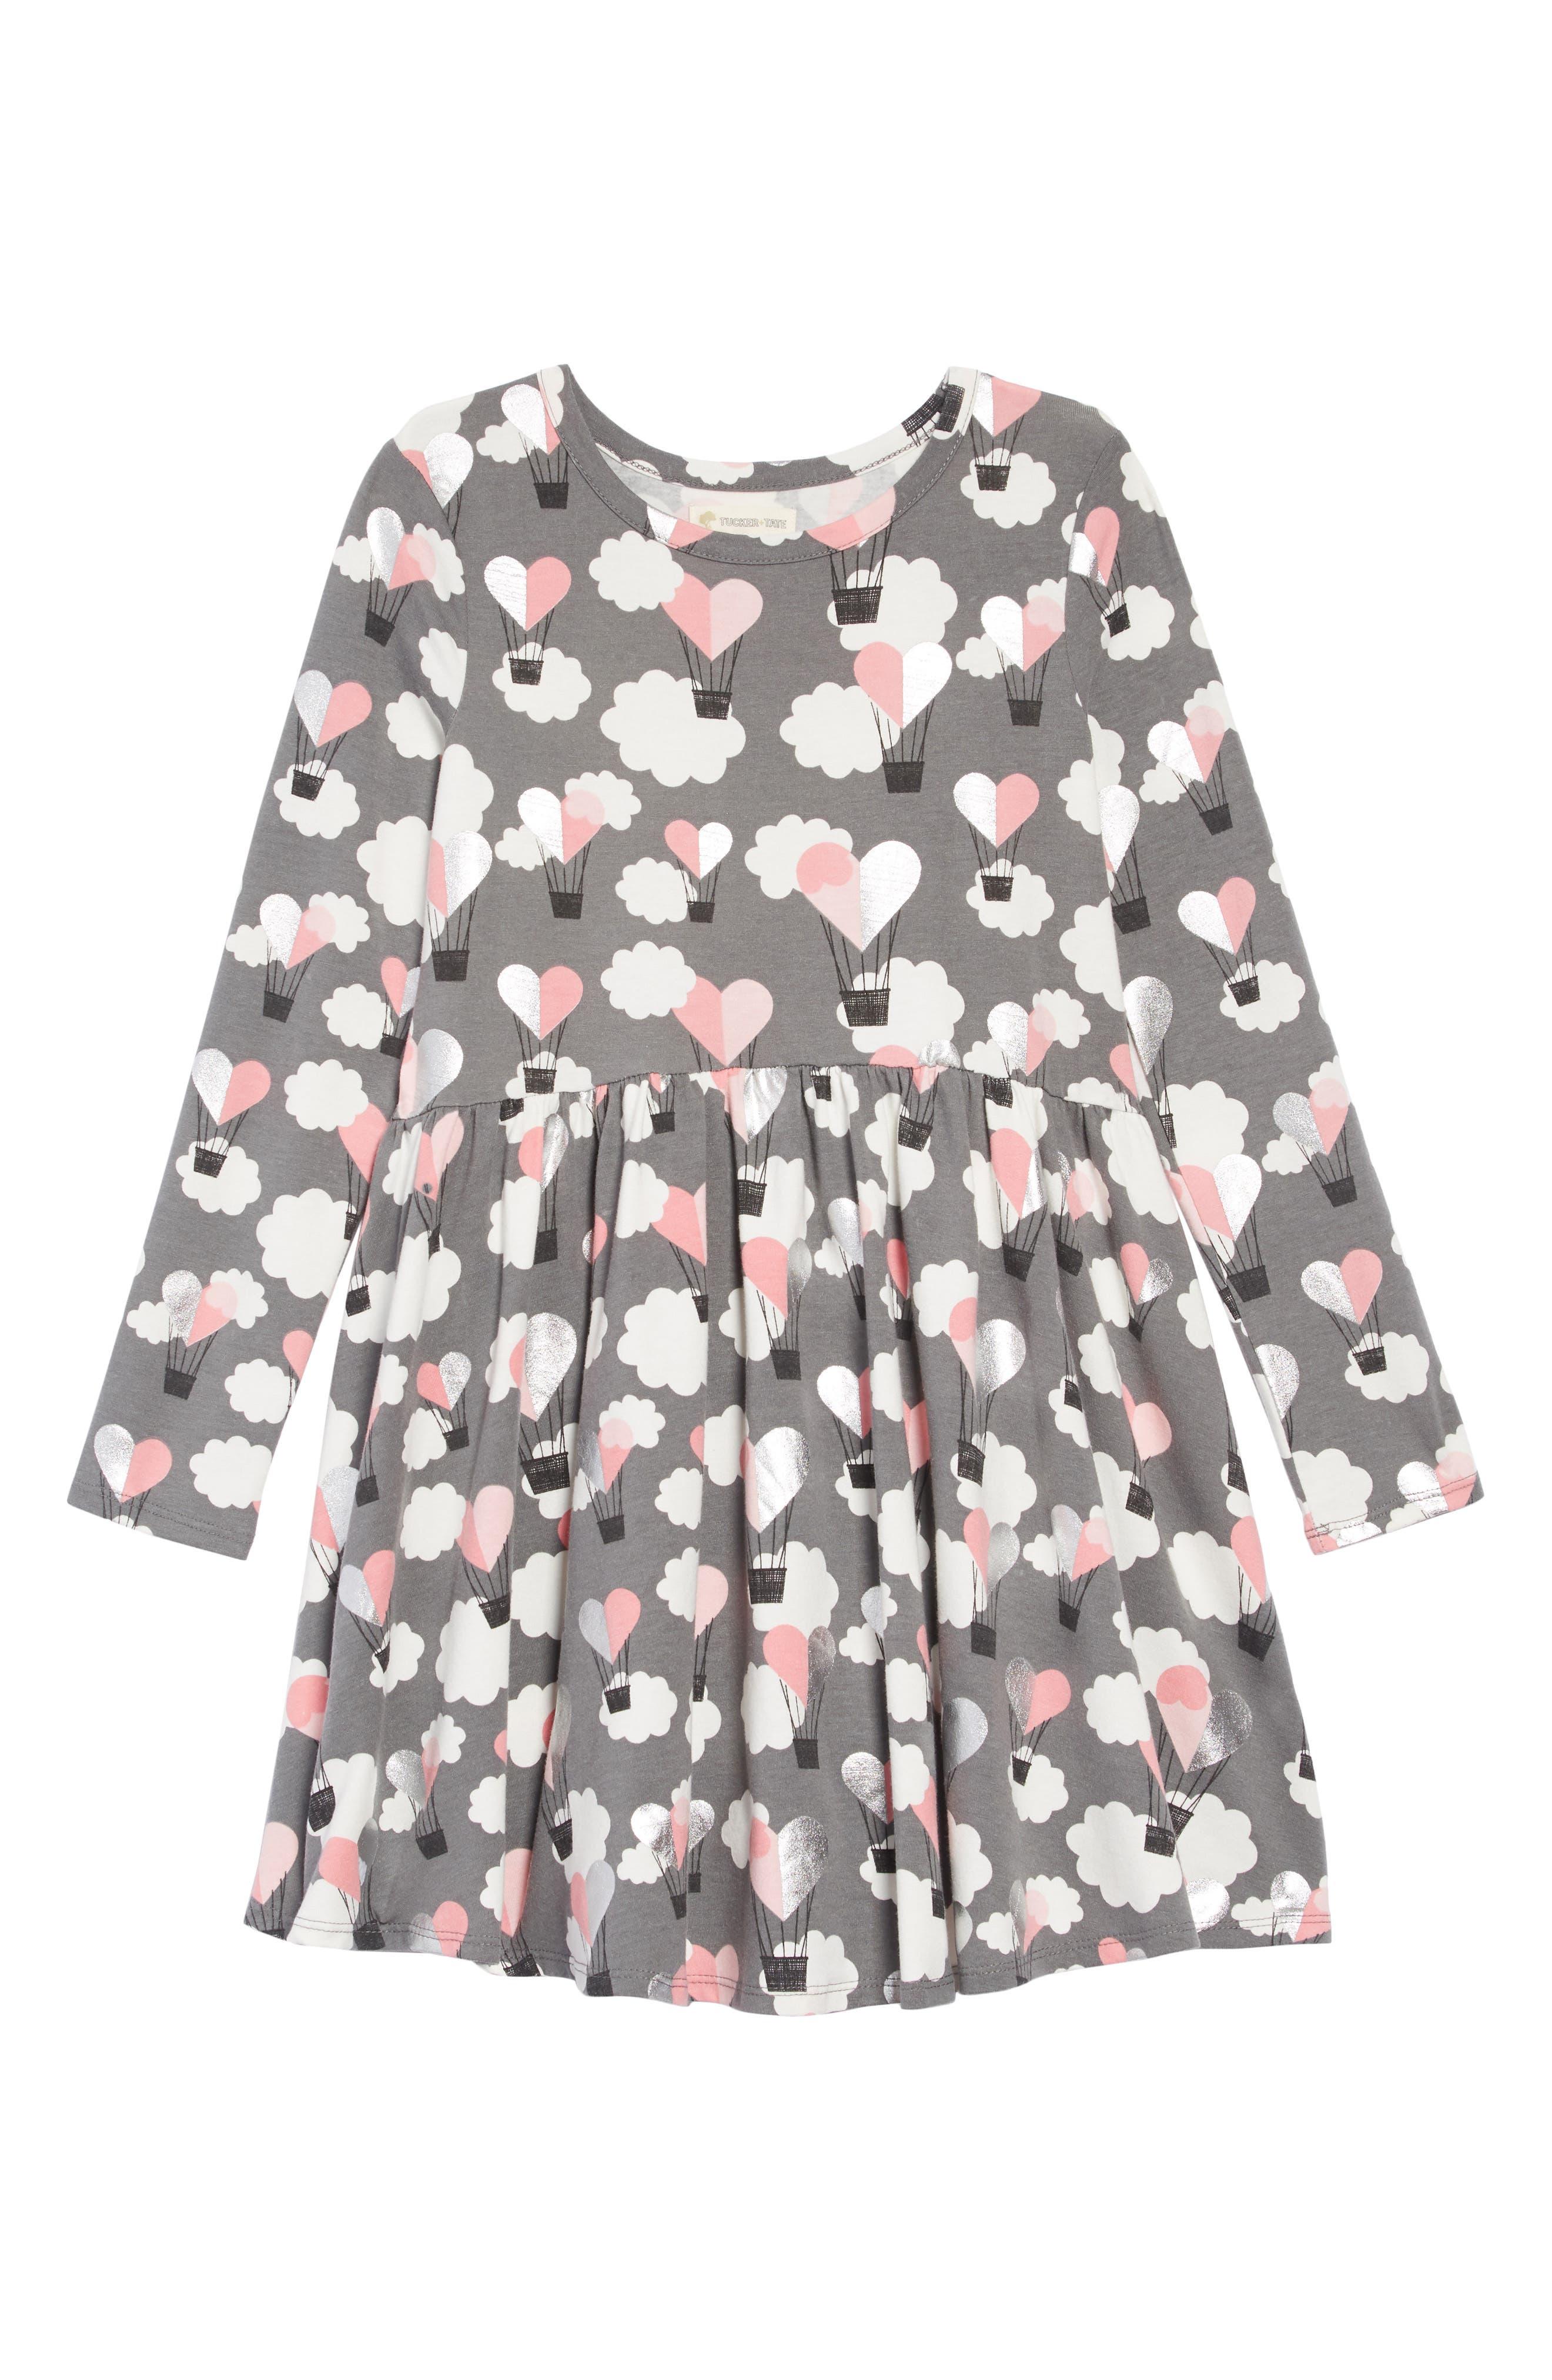 TUCKER + TATE Print Knit Dress, Main, color, 021